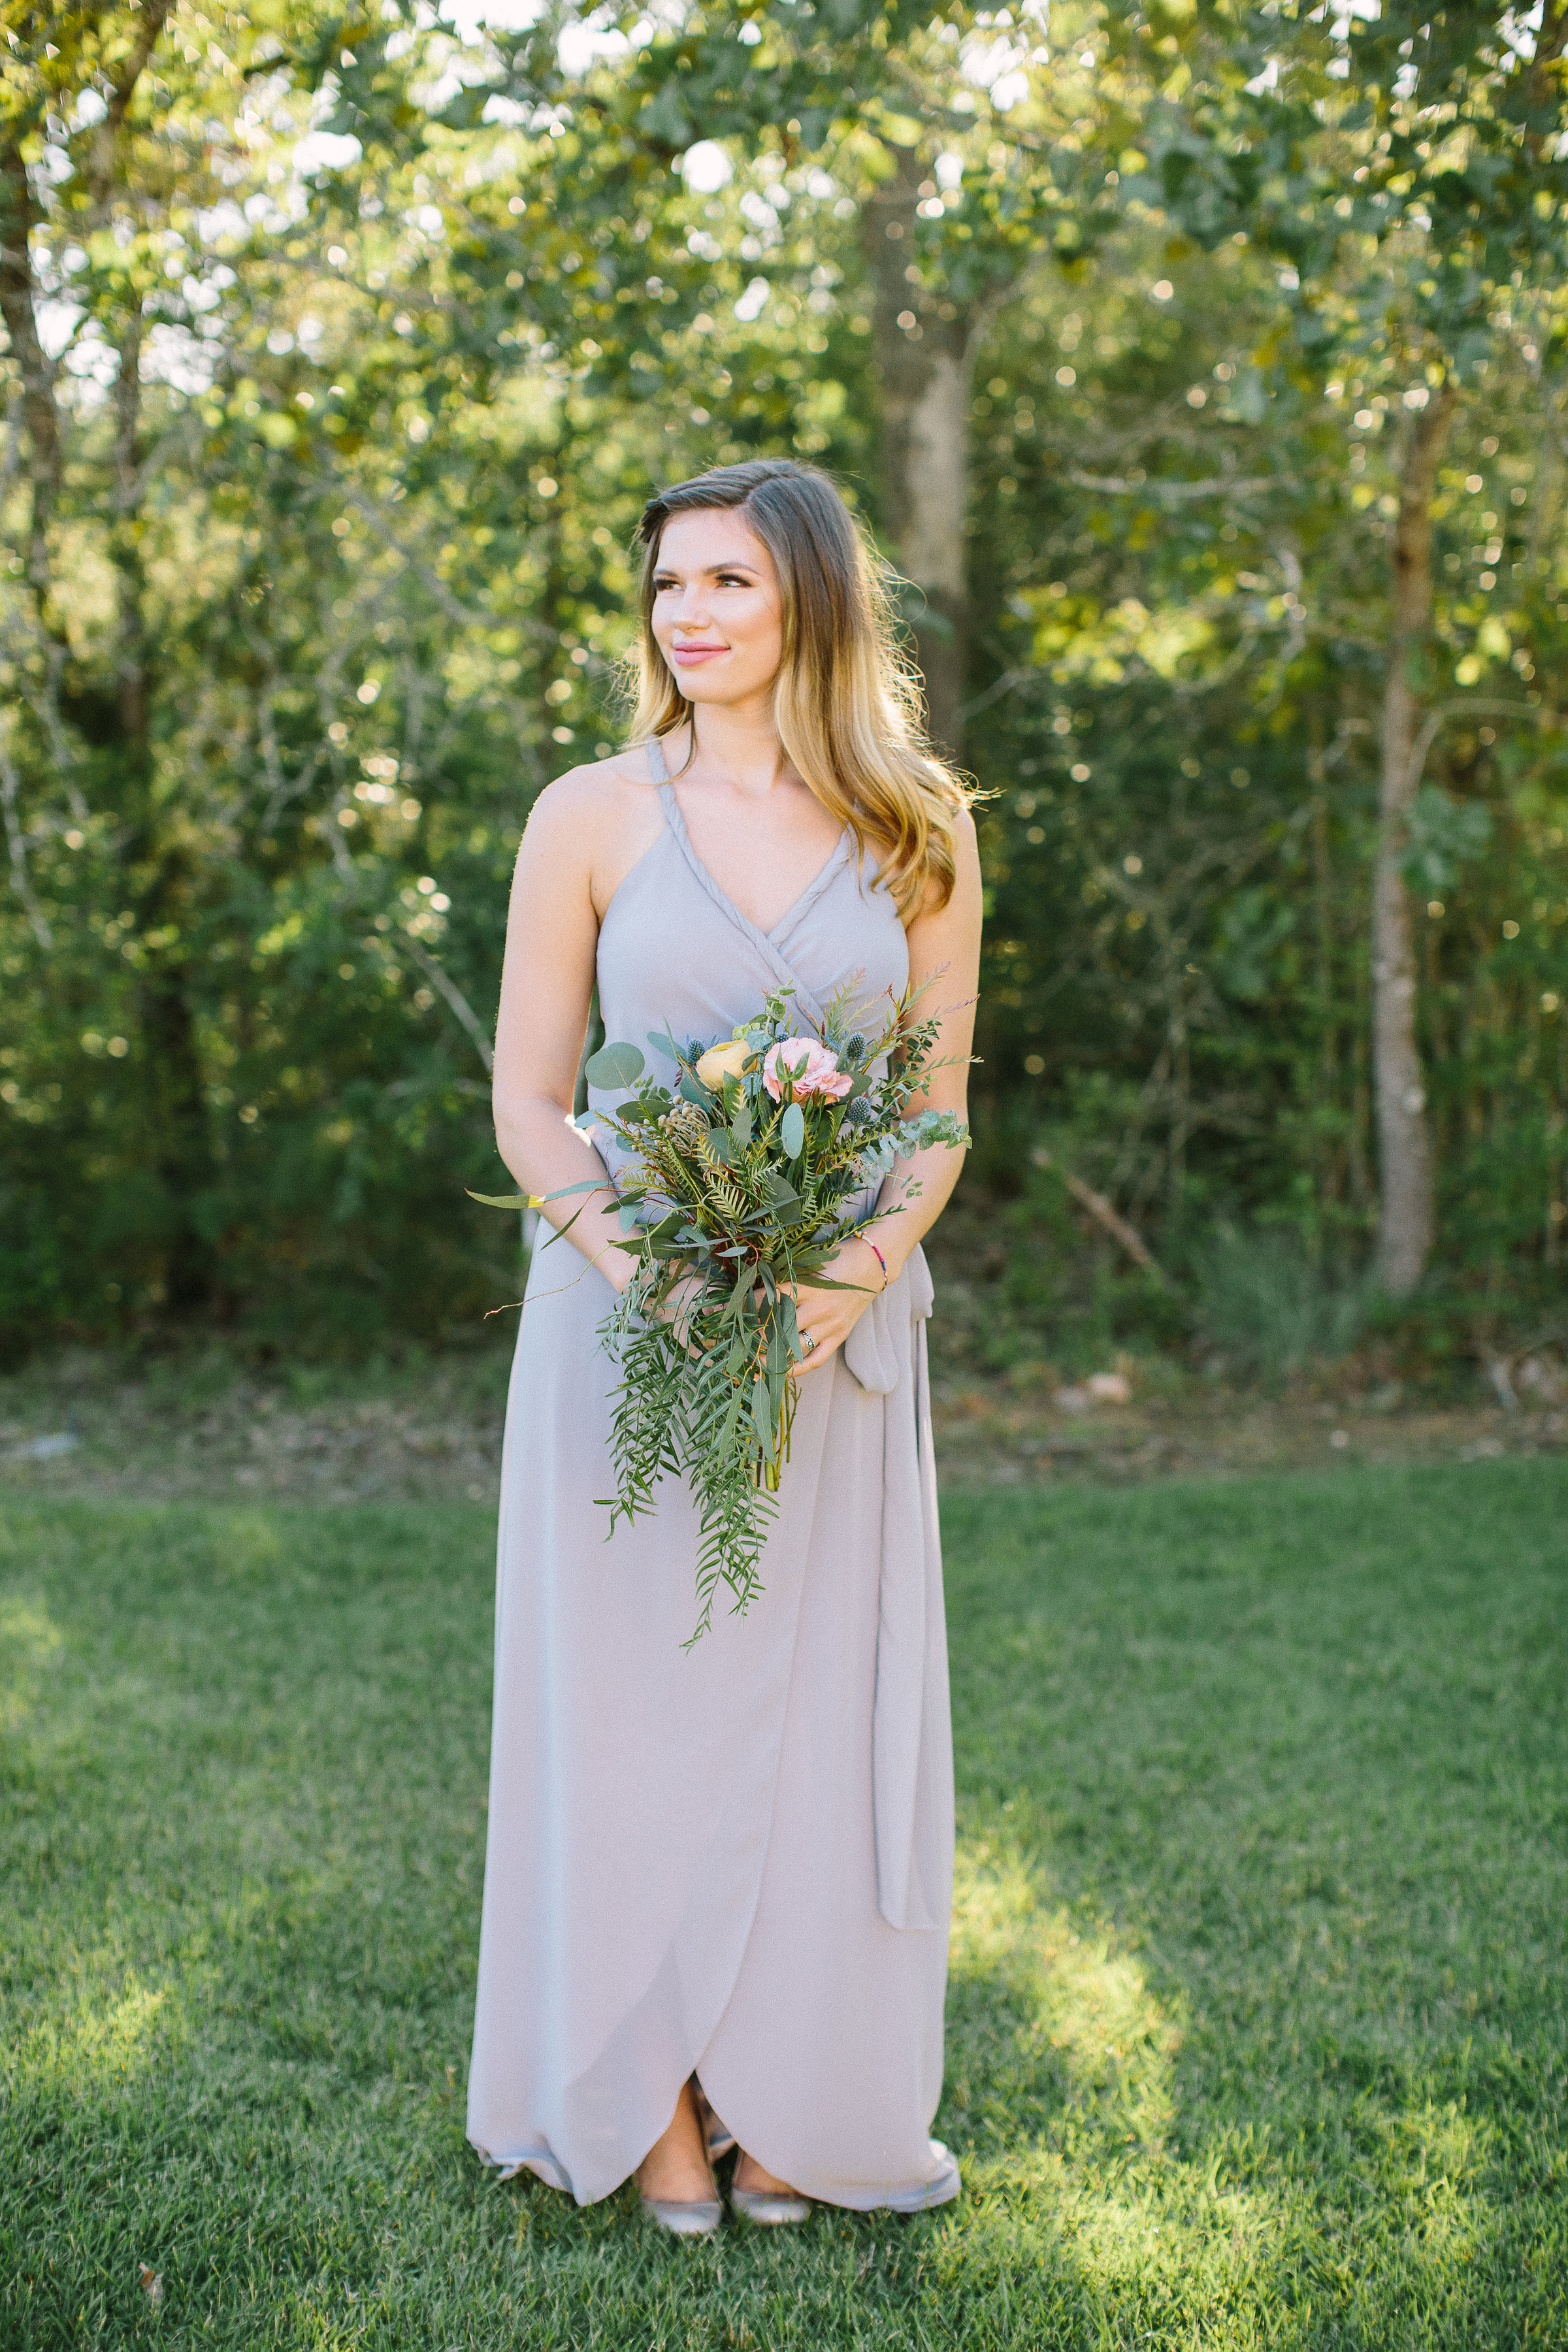 Ellen-Ashton-Photography-Peach-Creek-Ranch-Weddings-Wed-and-Prosper181